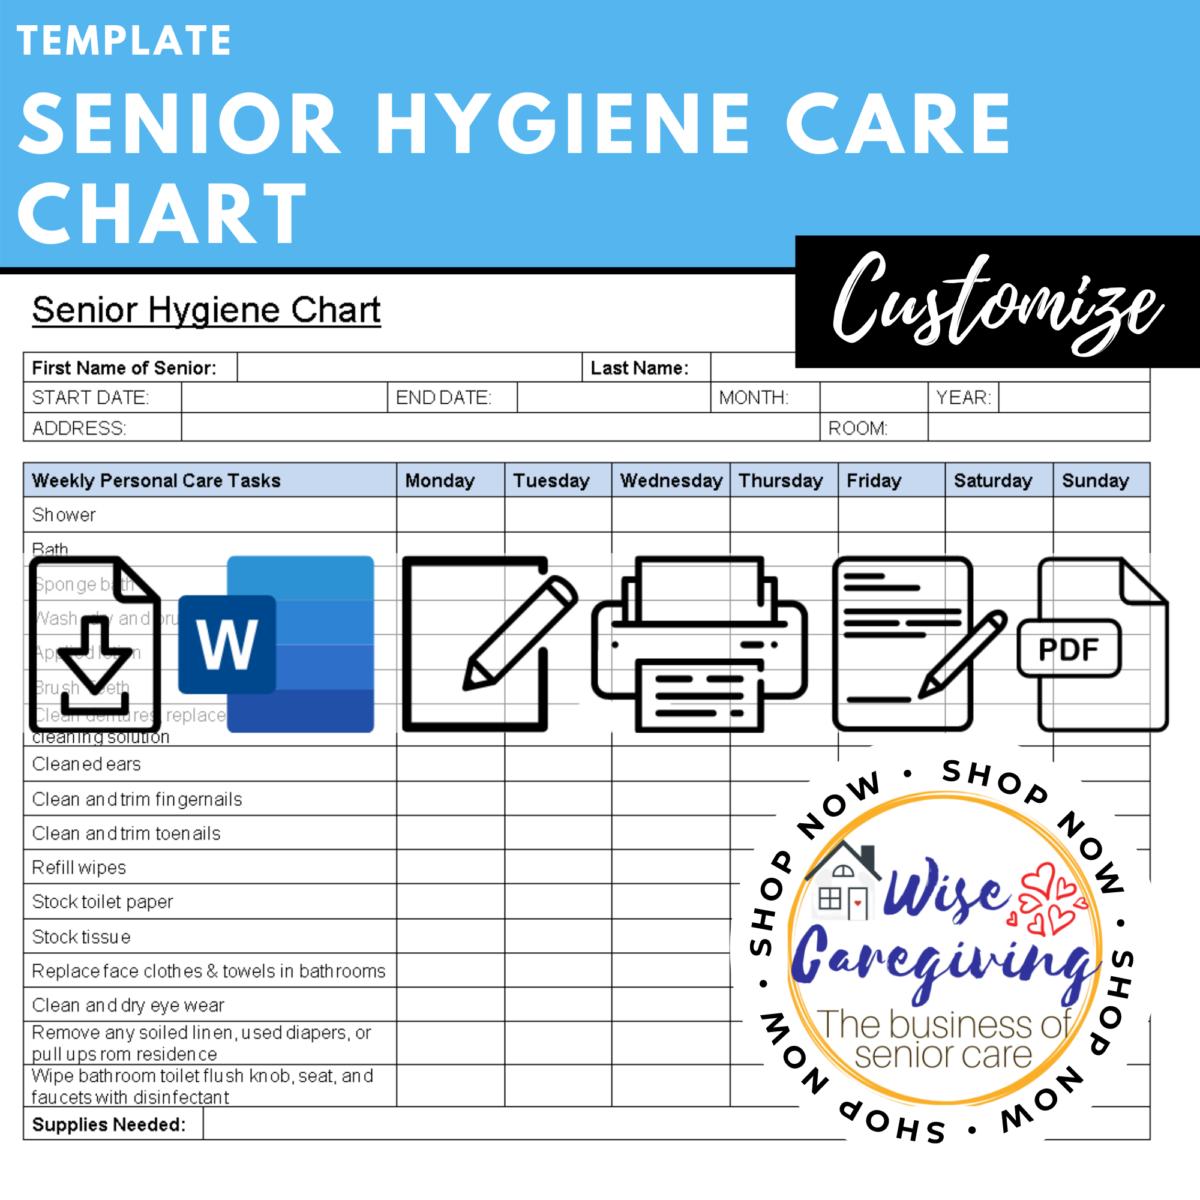 senior hygiene care chart template-wise caregiving (4)